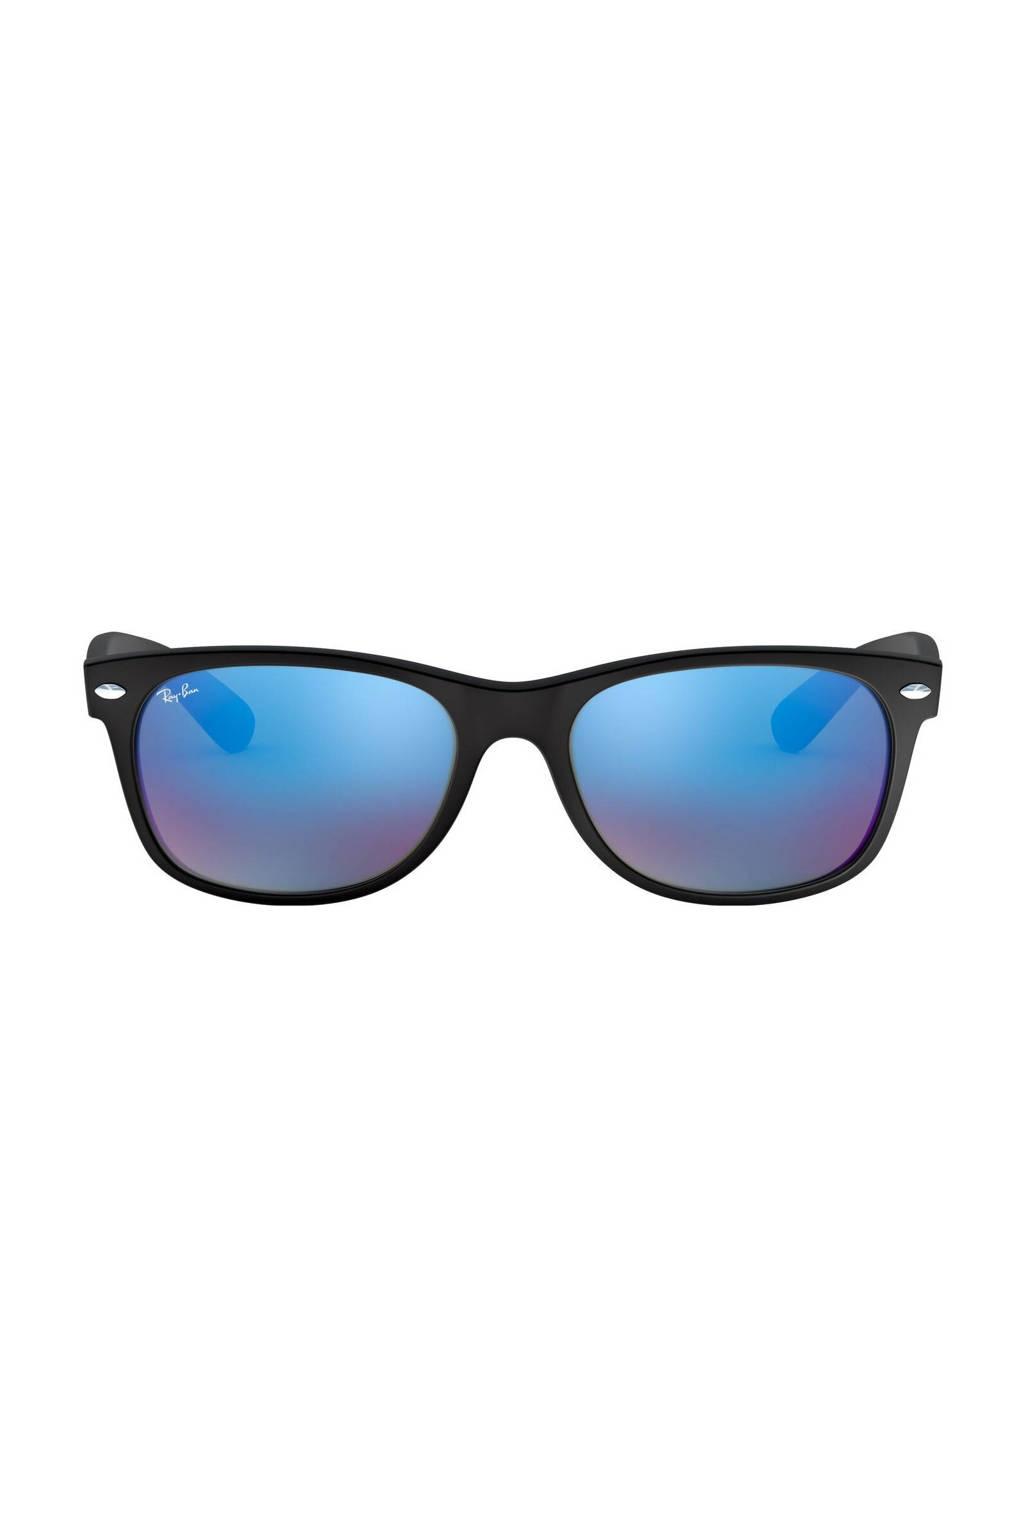 e84da7167d3809 Ray-Ban zonnebril 0RB2132